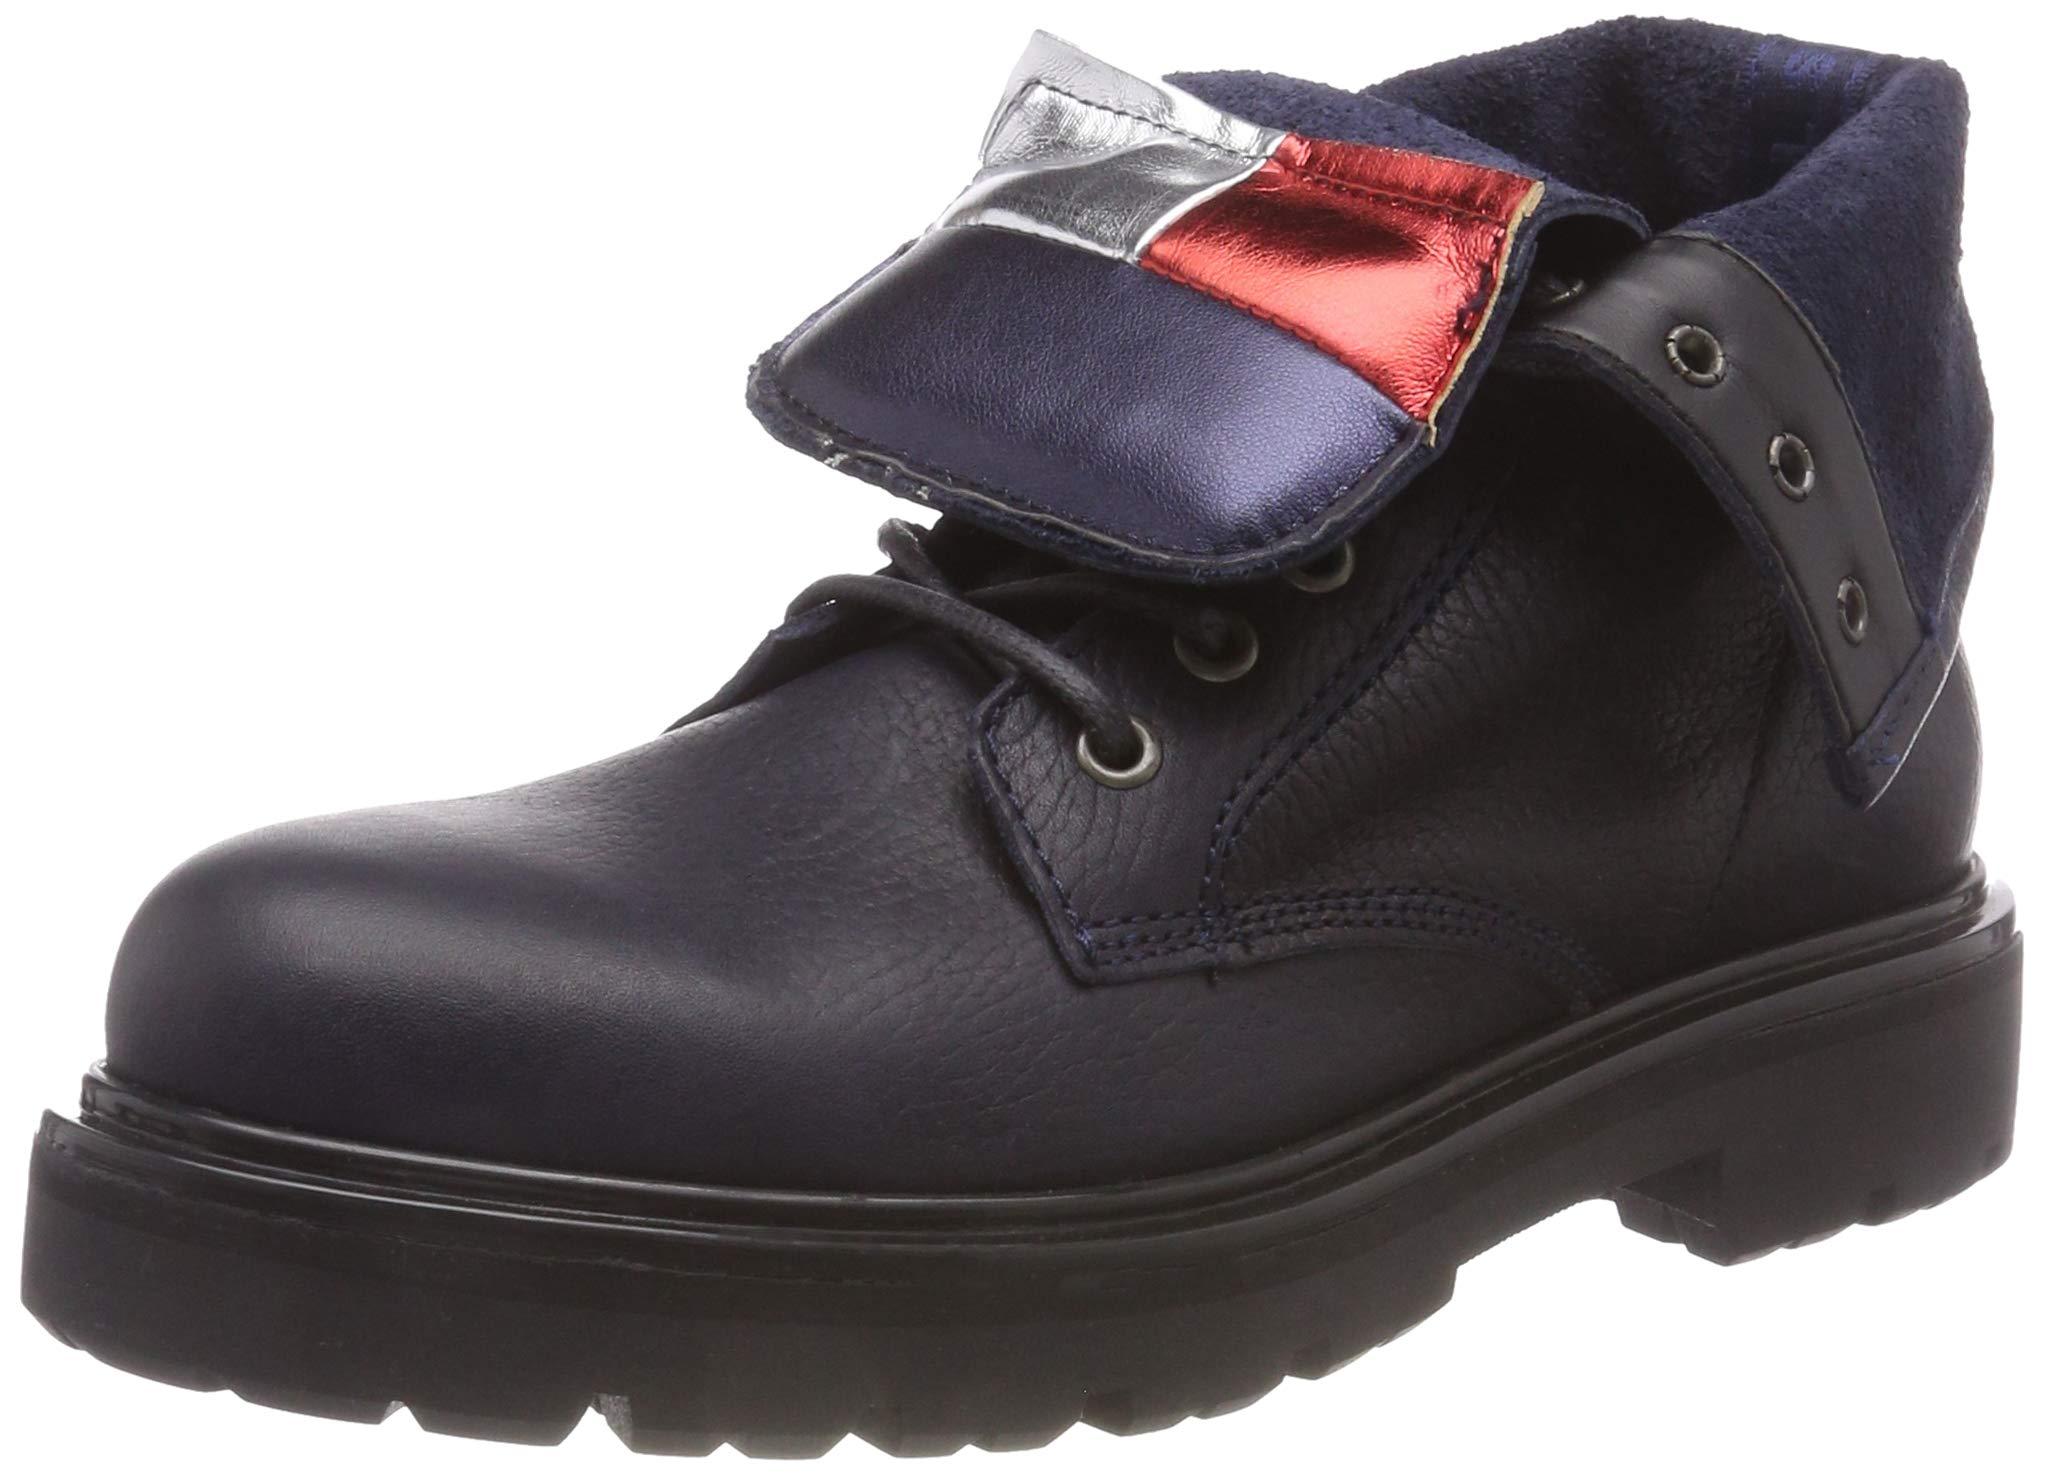 BootBottes Lace Flag Rangers Tommy Denim Hilfiger Up Big Jeans FemmeNoirblack Eu 99037 sdCtrBQxh